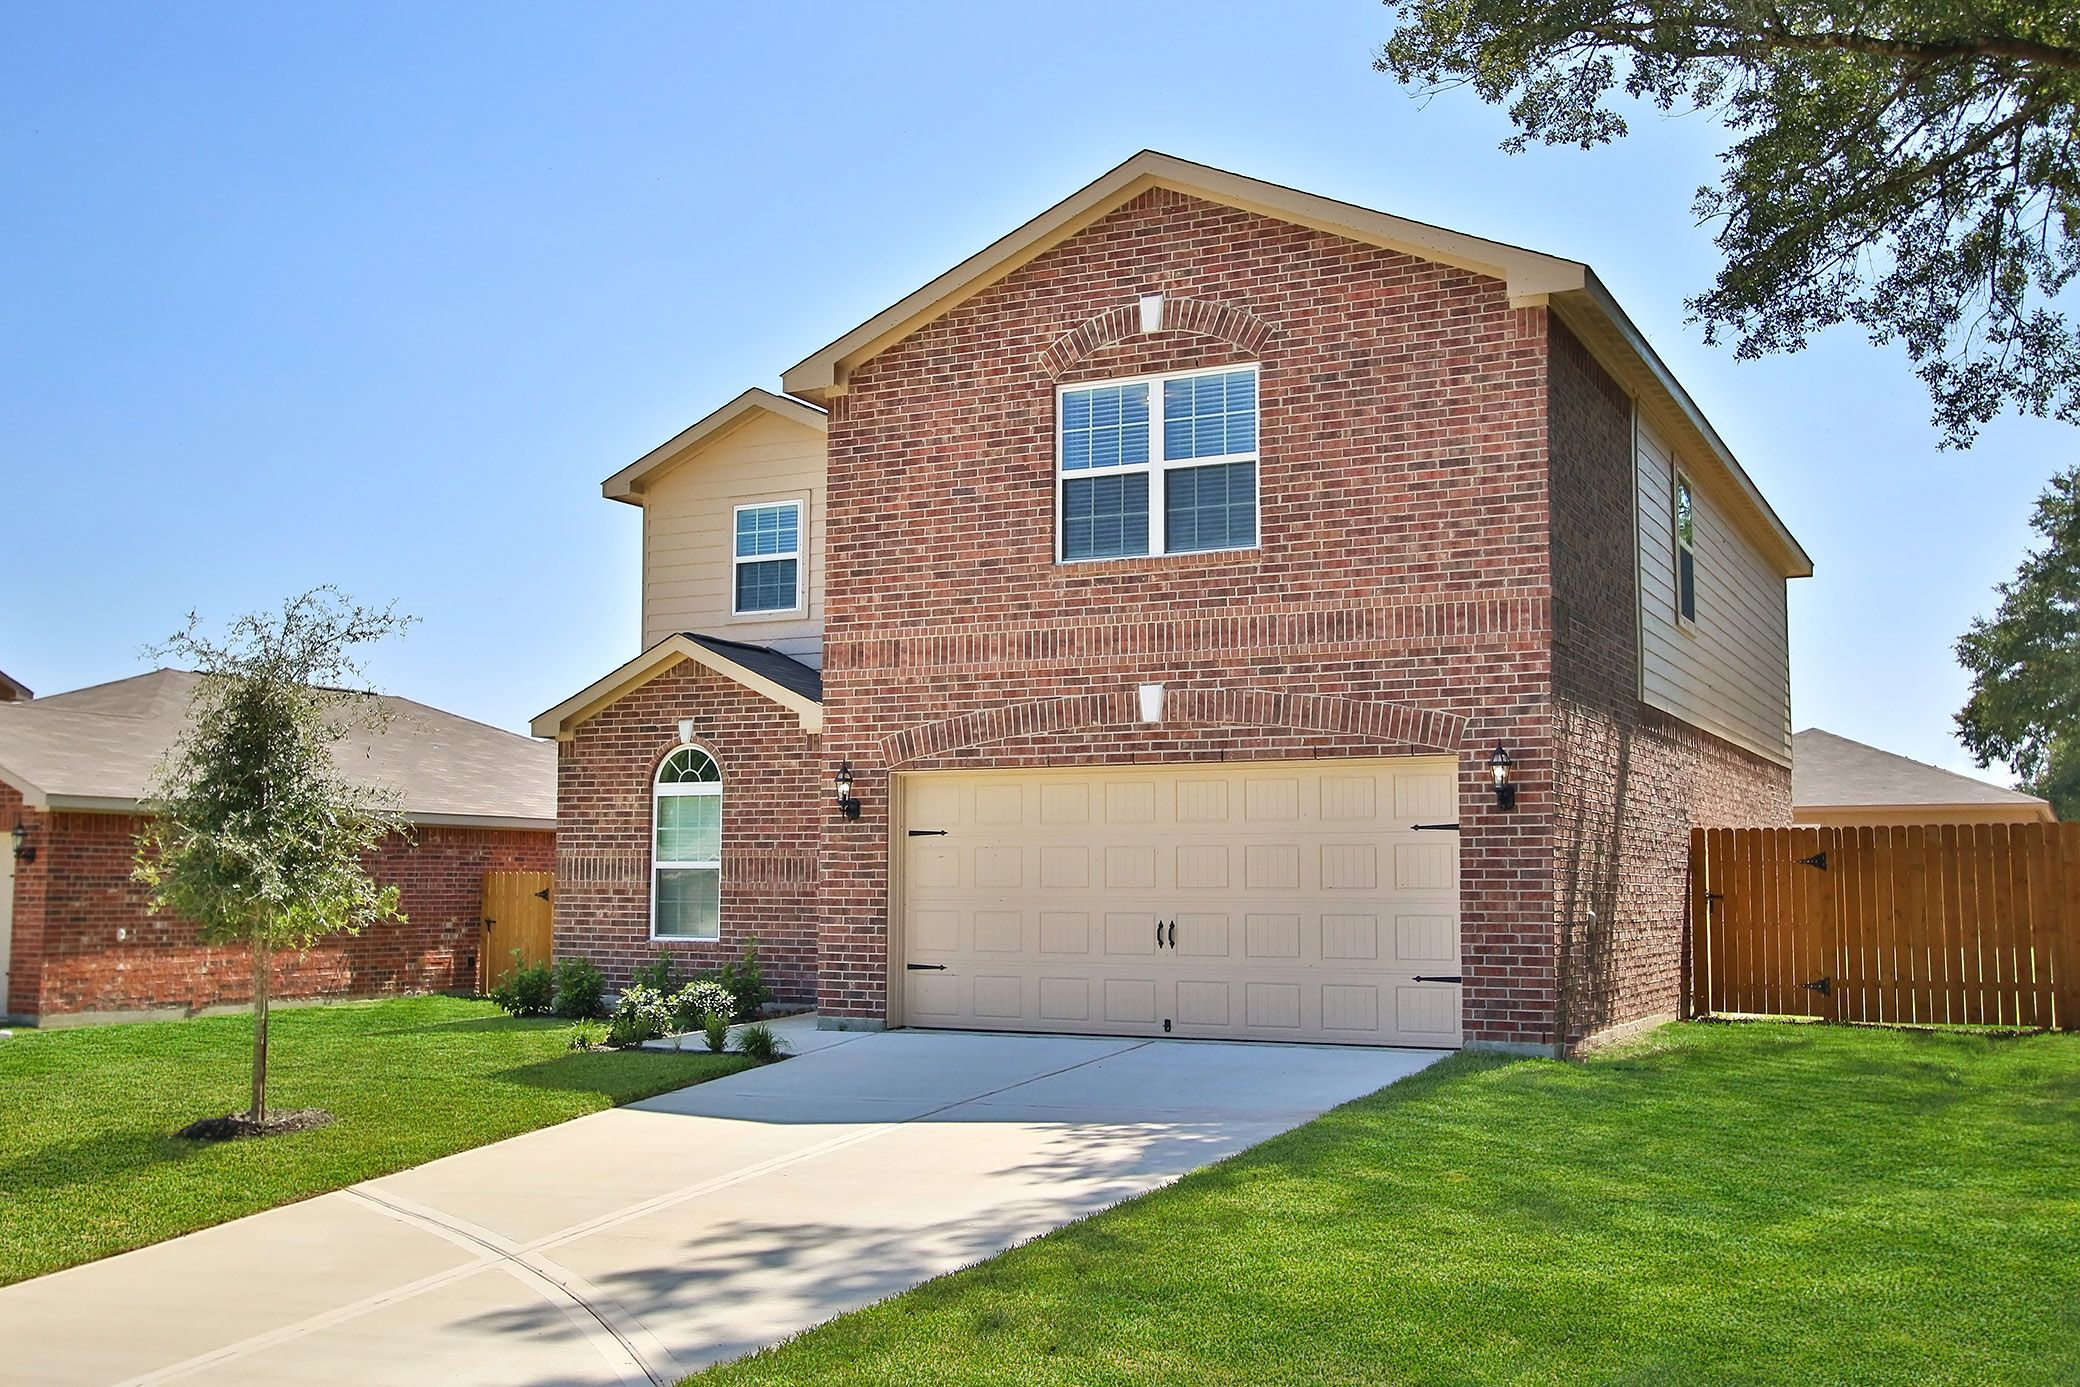 Villa North in Houston TX New Homes Floor Plans by LGI Homes